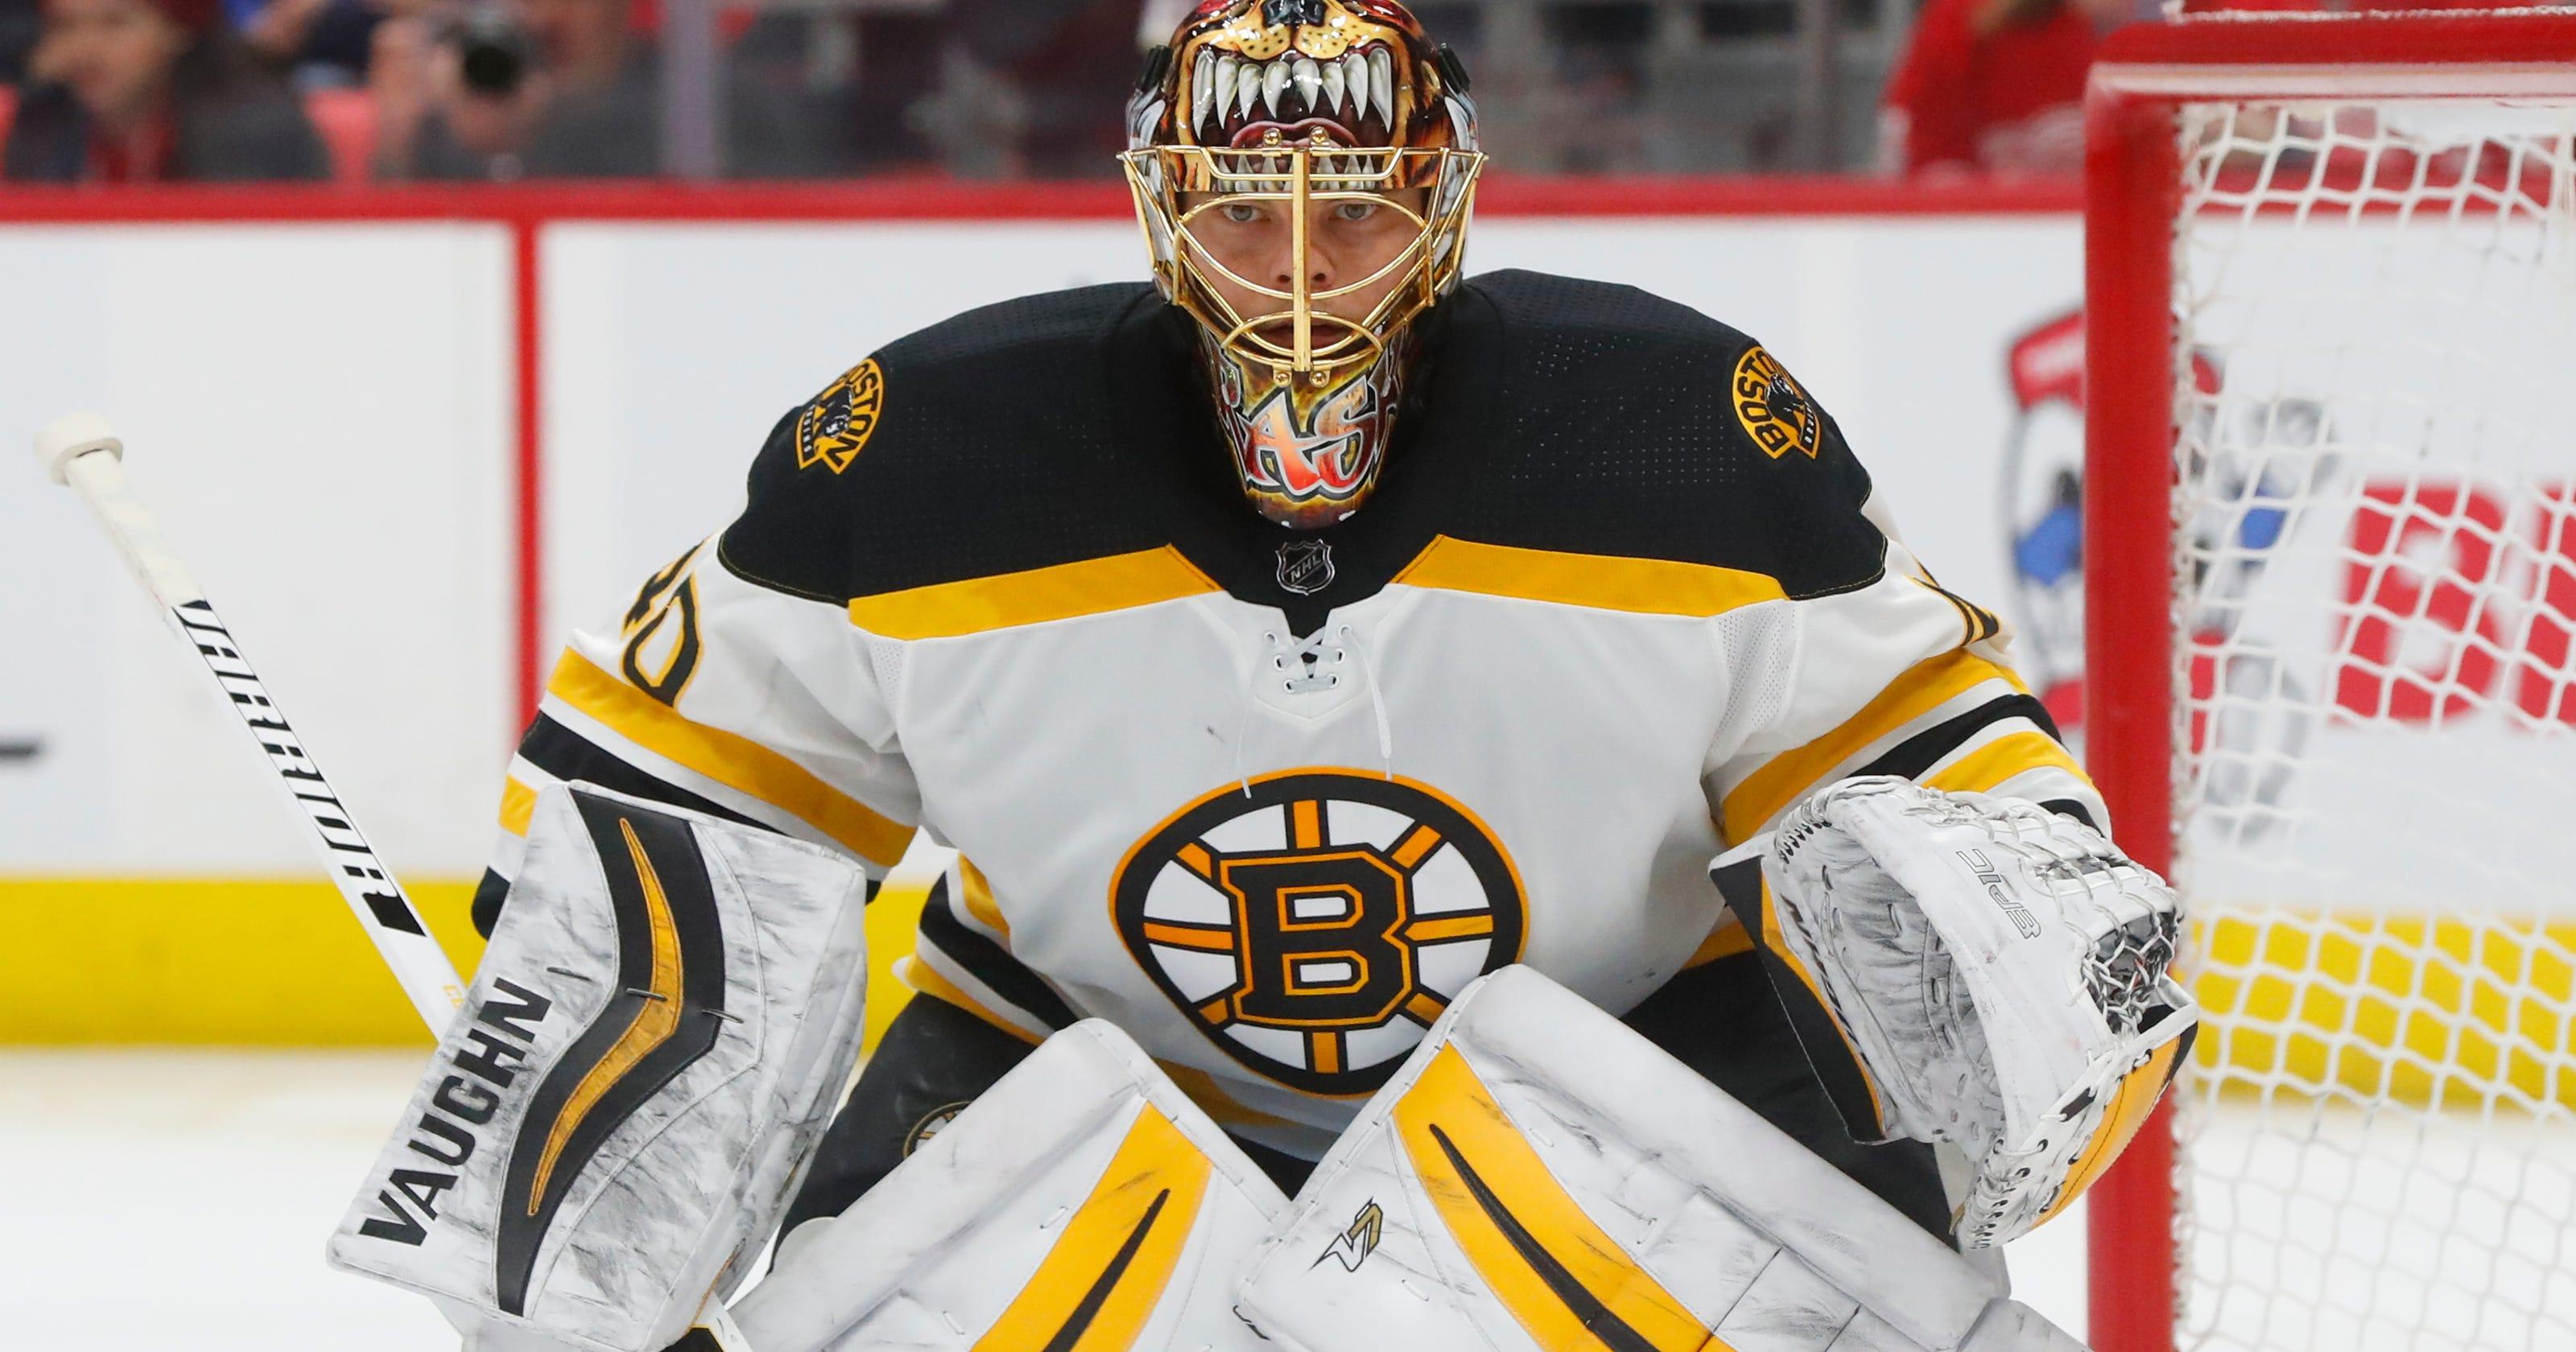 Tuukka Rask  Boston Bruins goalie back at practice after 3-day leave 09df3a180